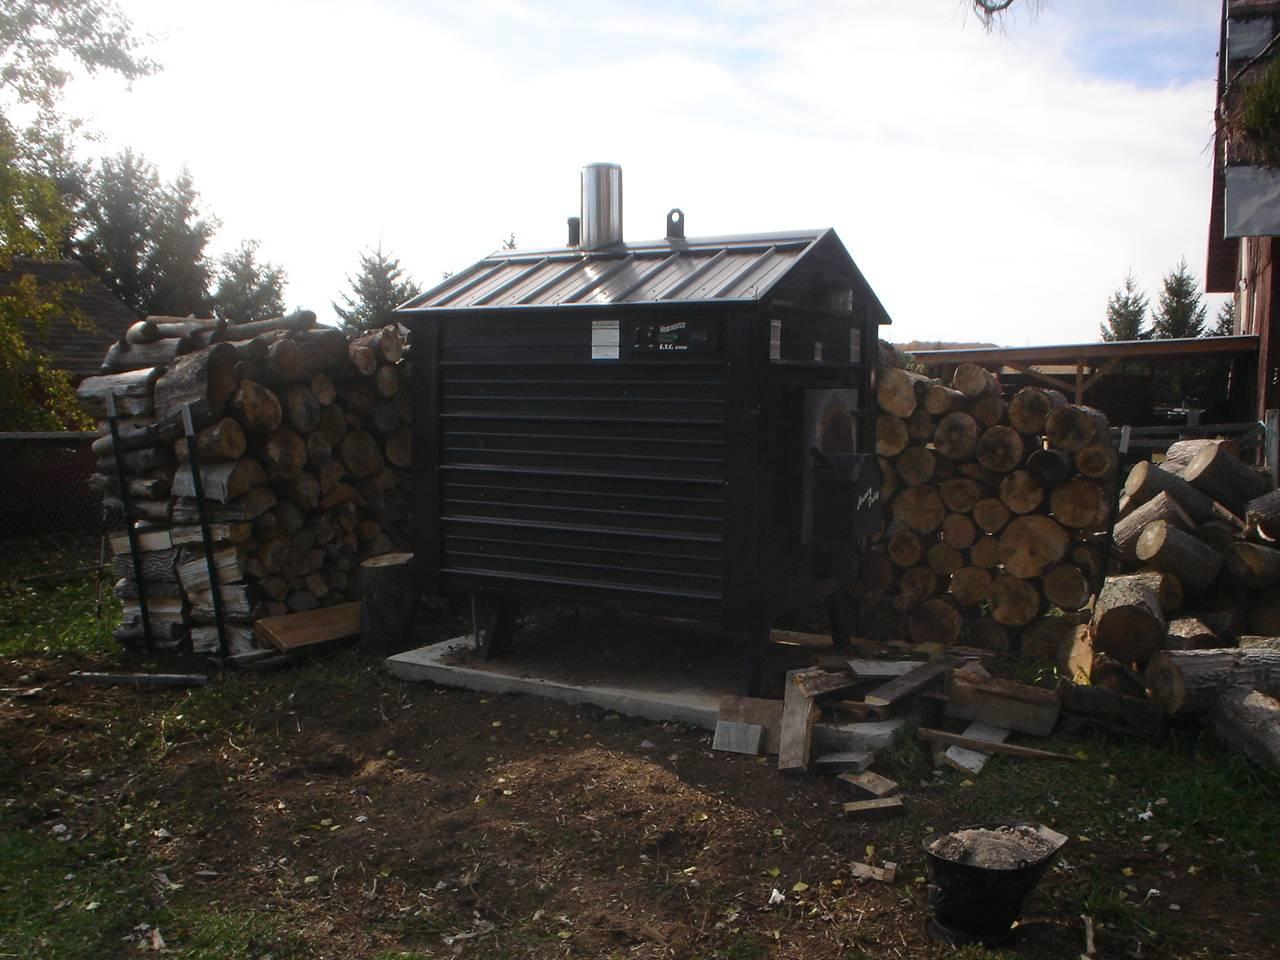 The woodstove